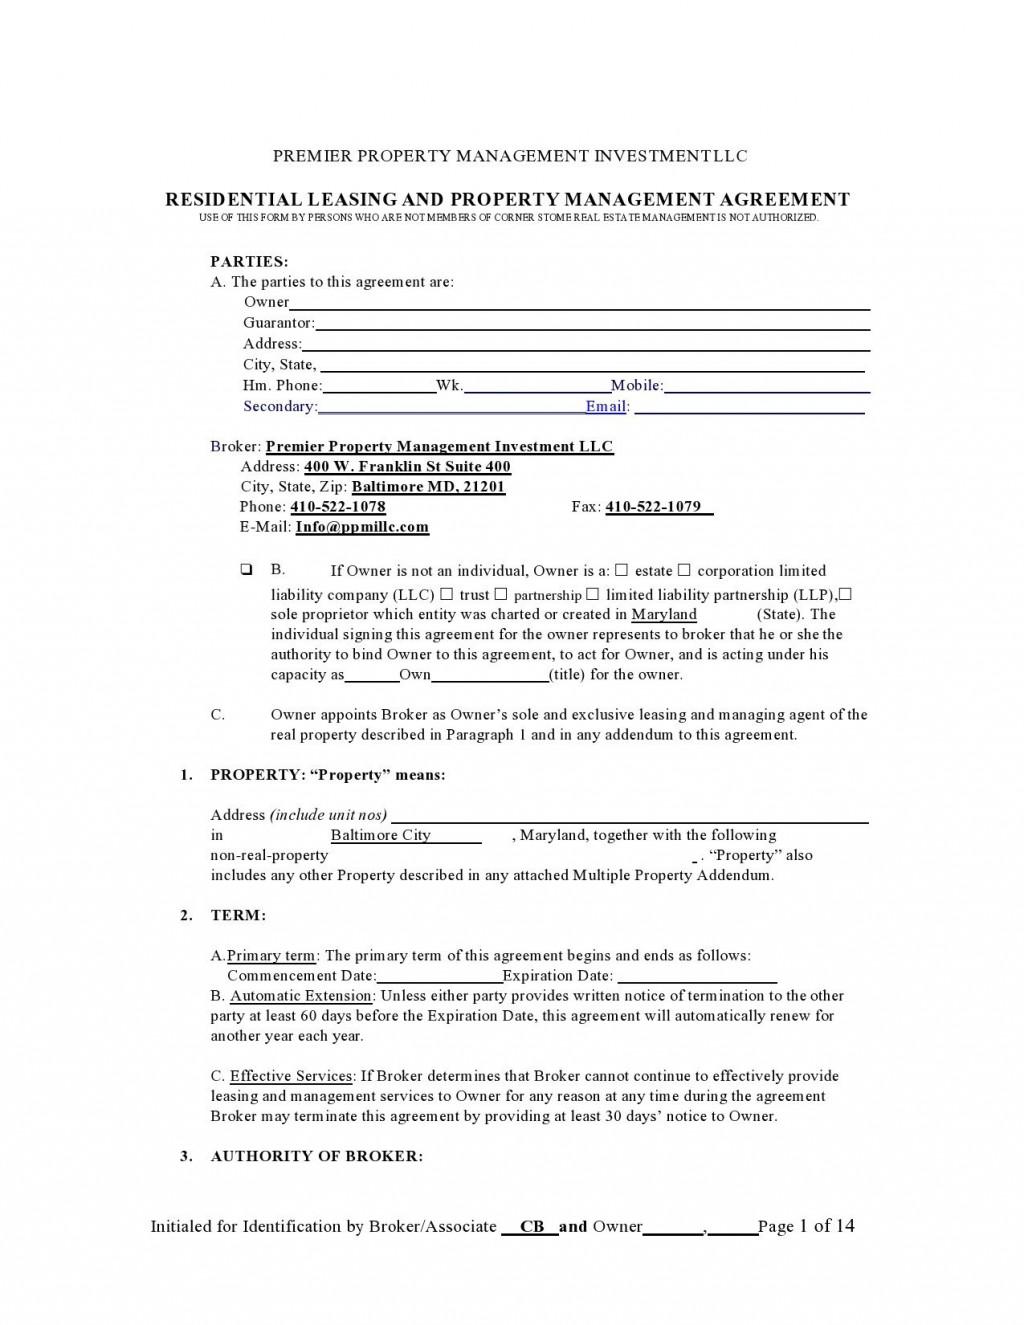 004 Impressive Commercial Property Management Agreement Template Uk Concept Large